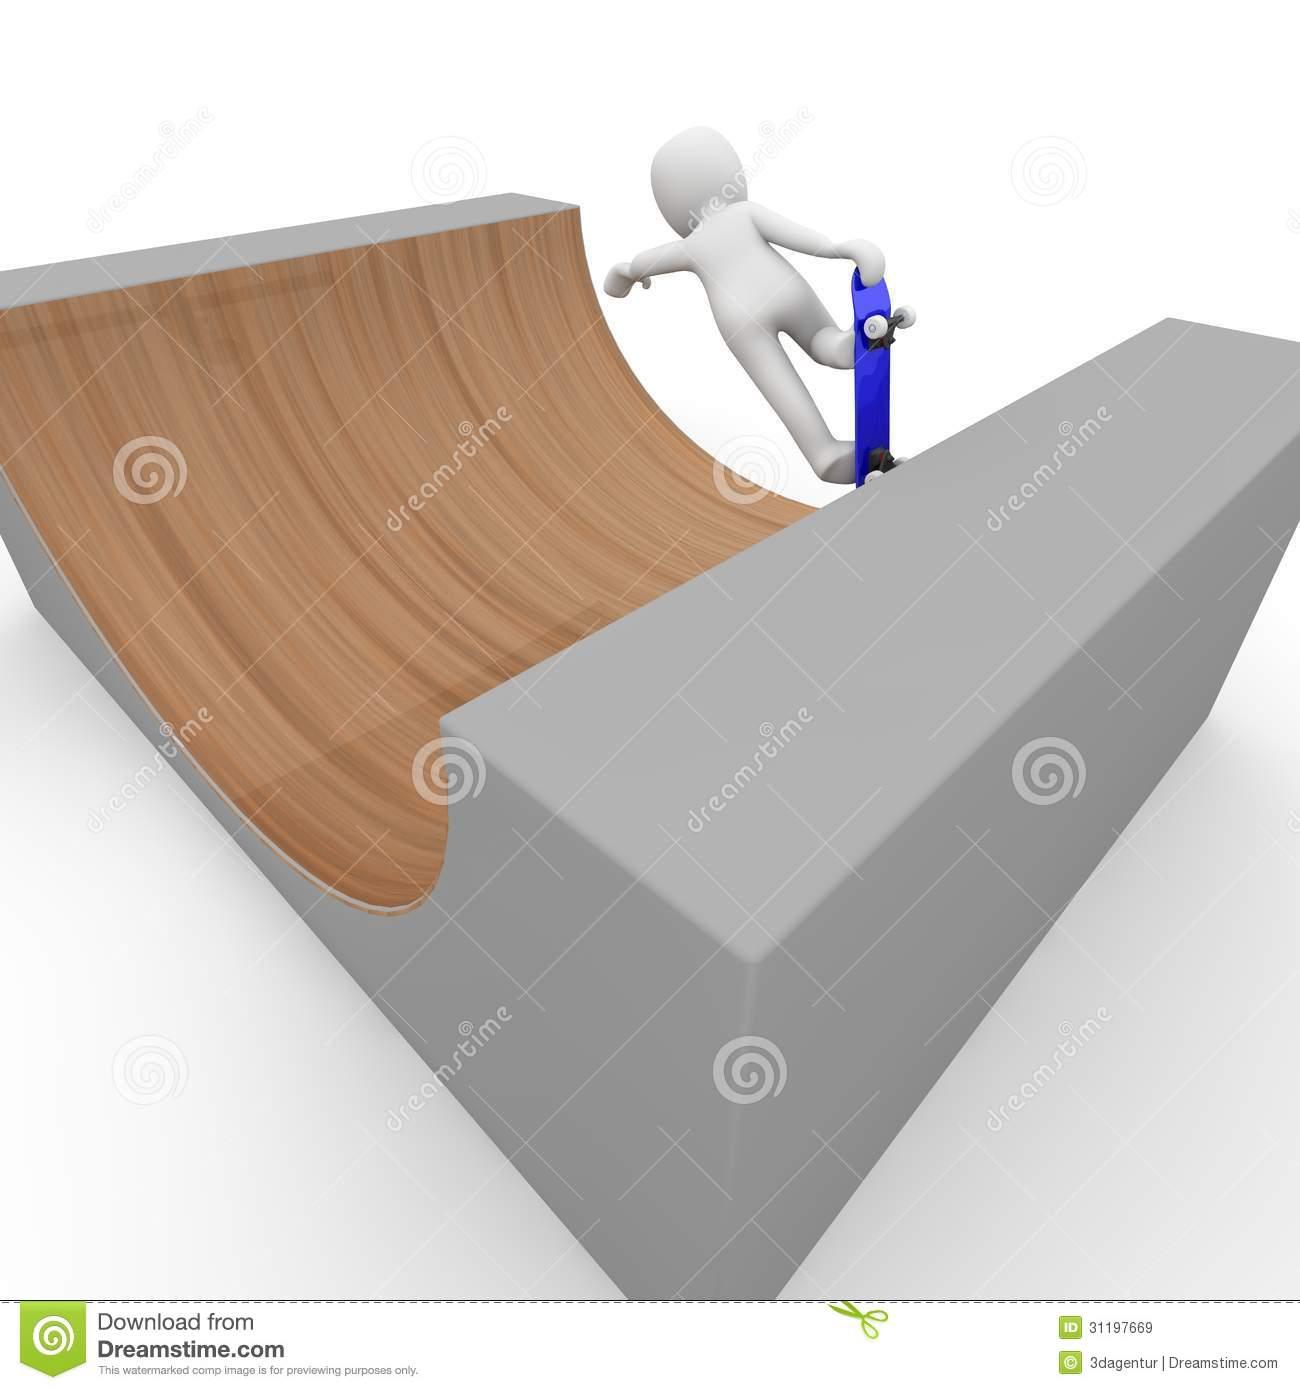 Halfpipe With Skateboard Stock Image.